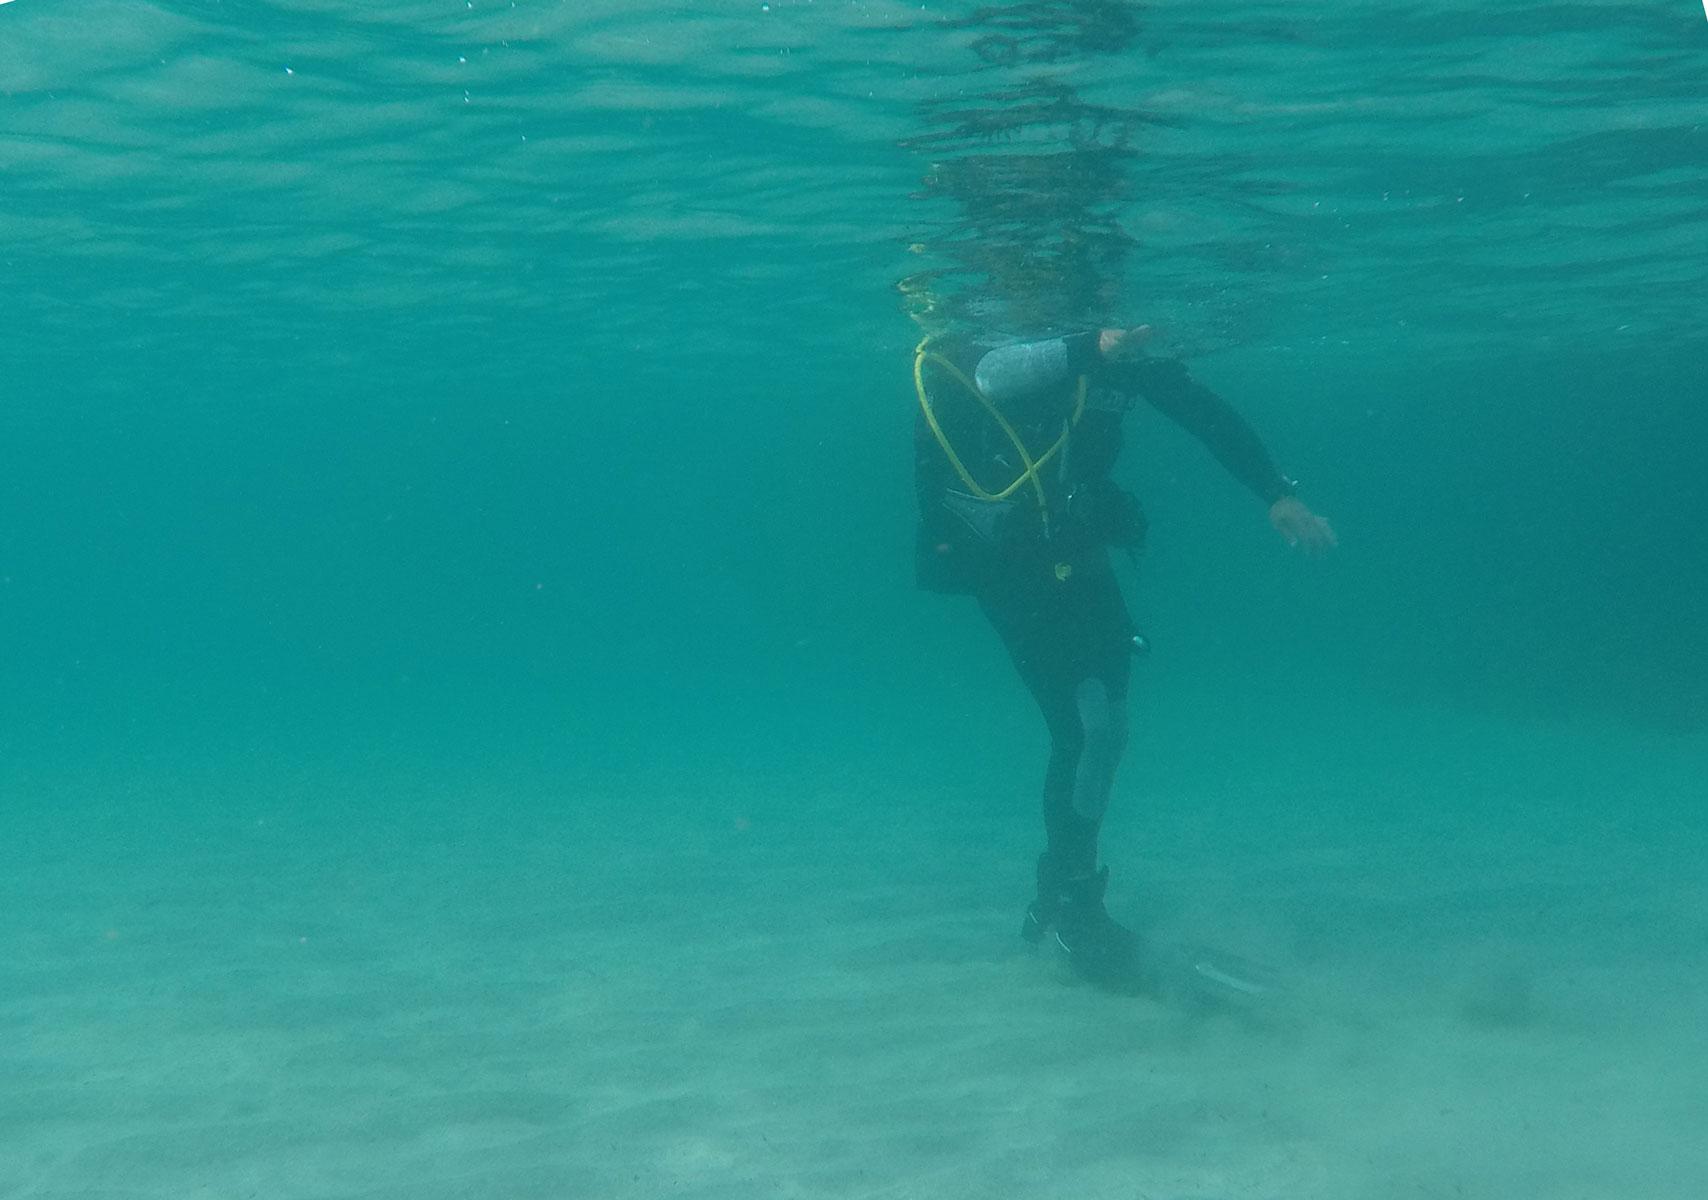 Bautizo de mar